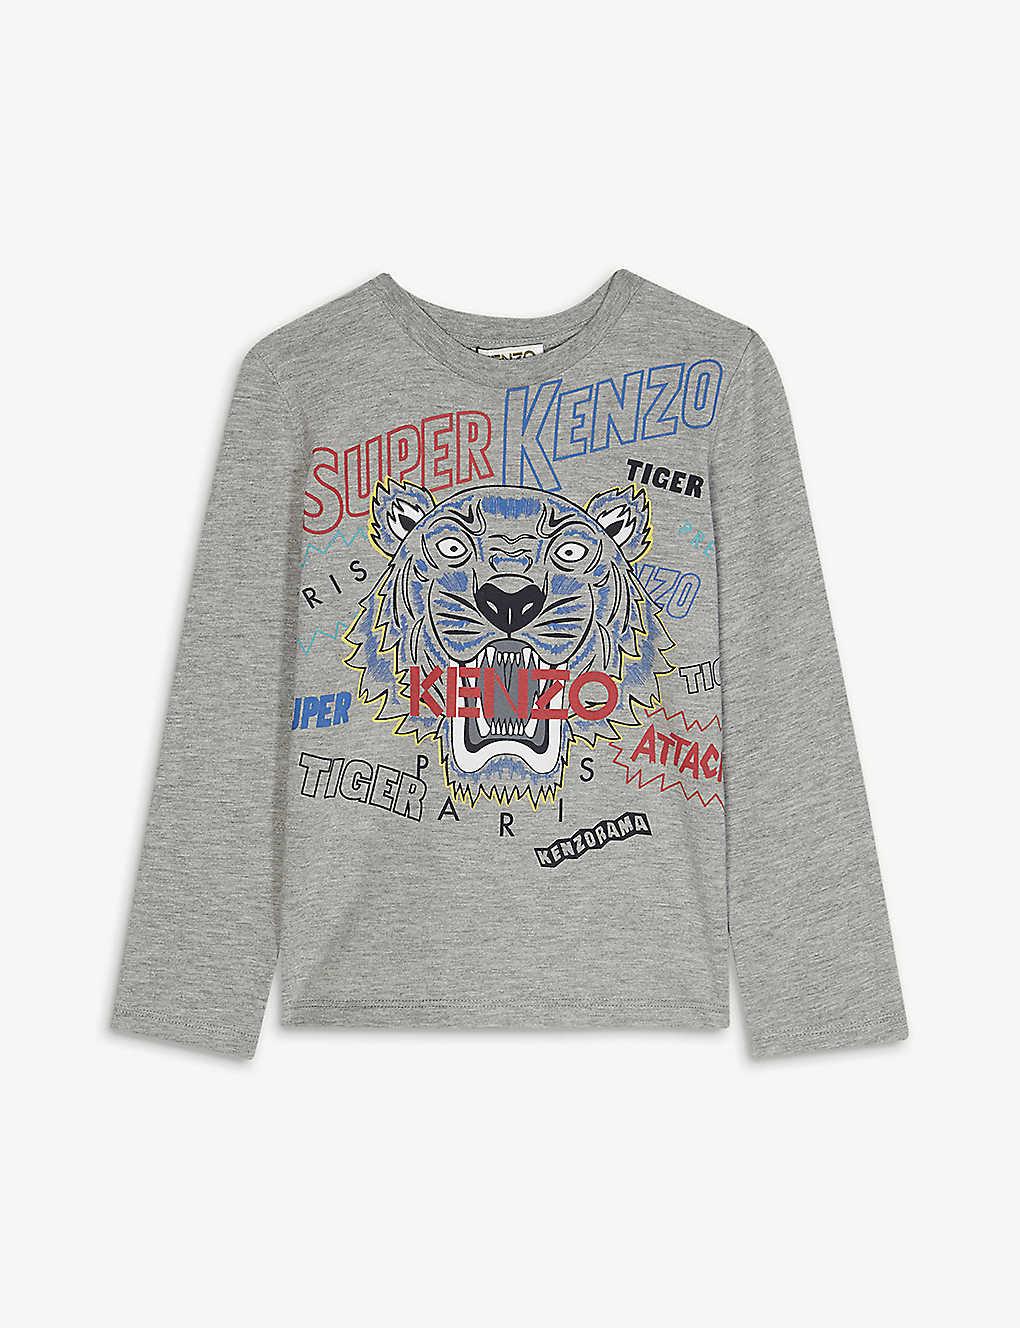 0c8f9341d159 KENZO - Super tiger cotton long-sleeve T-shirt 4-14 years ...